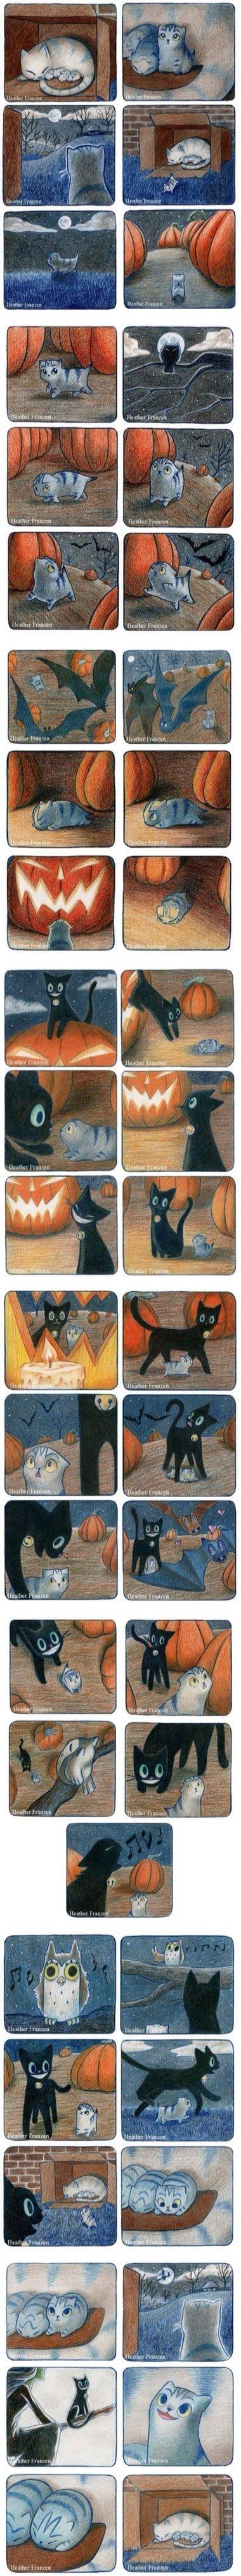 Cats.. . Urghey ! trae, iditor,' eihter . rascit Cats Urghey ! trae iditor ' eihter rascit